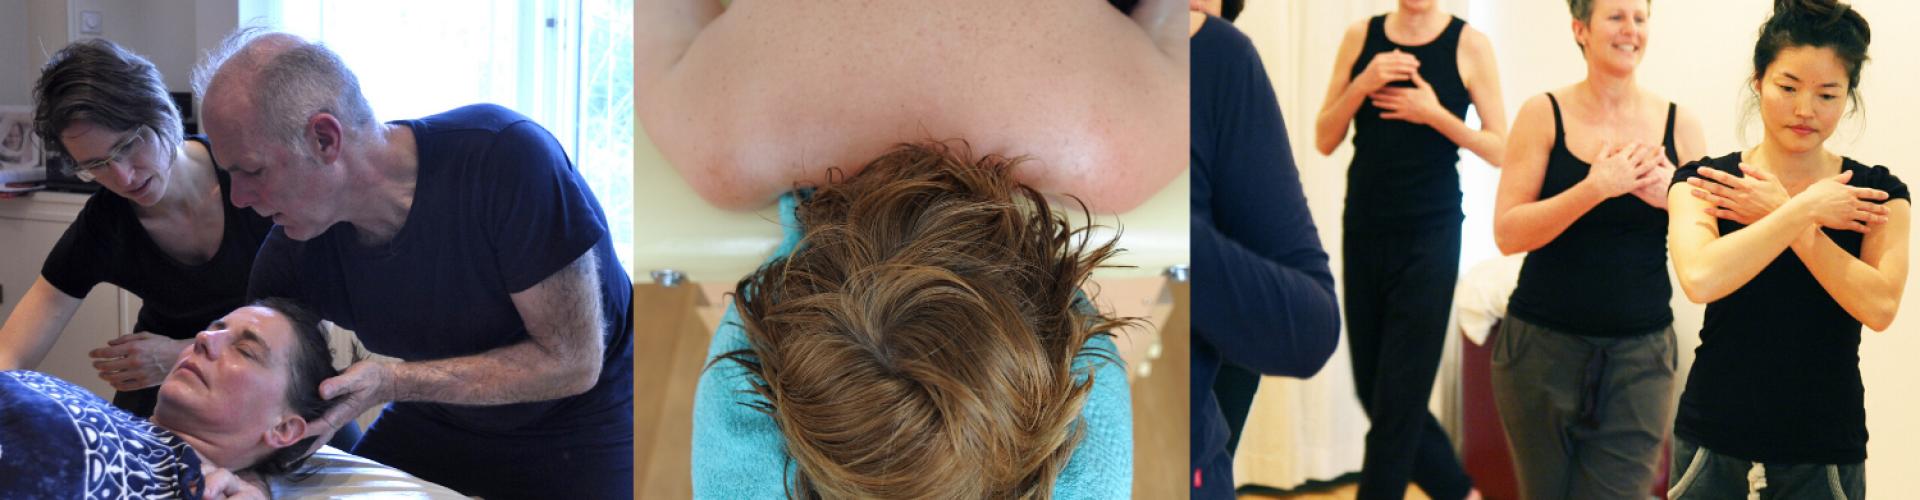 lomi-lomi-massage-workshop